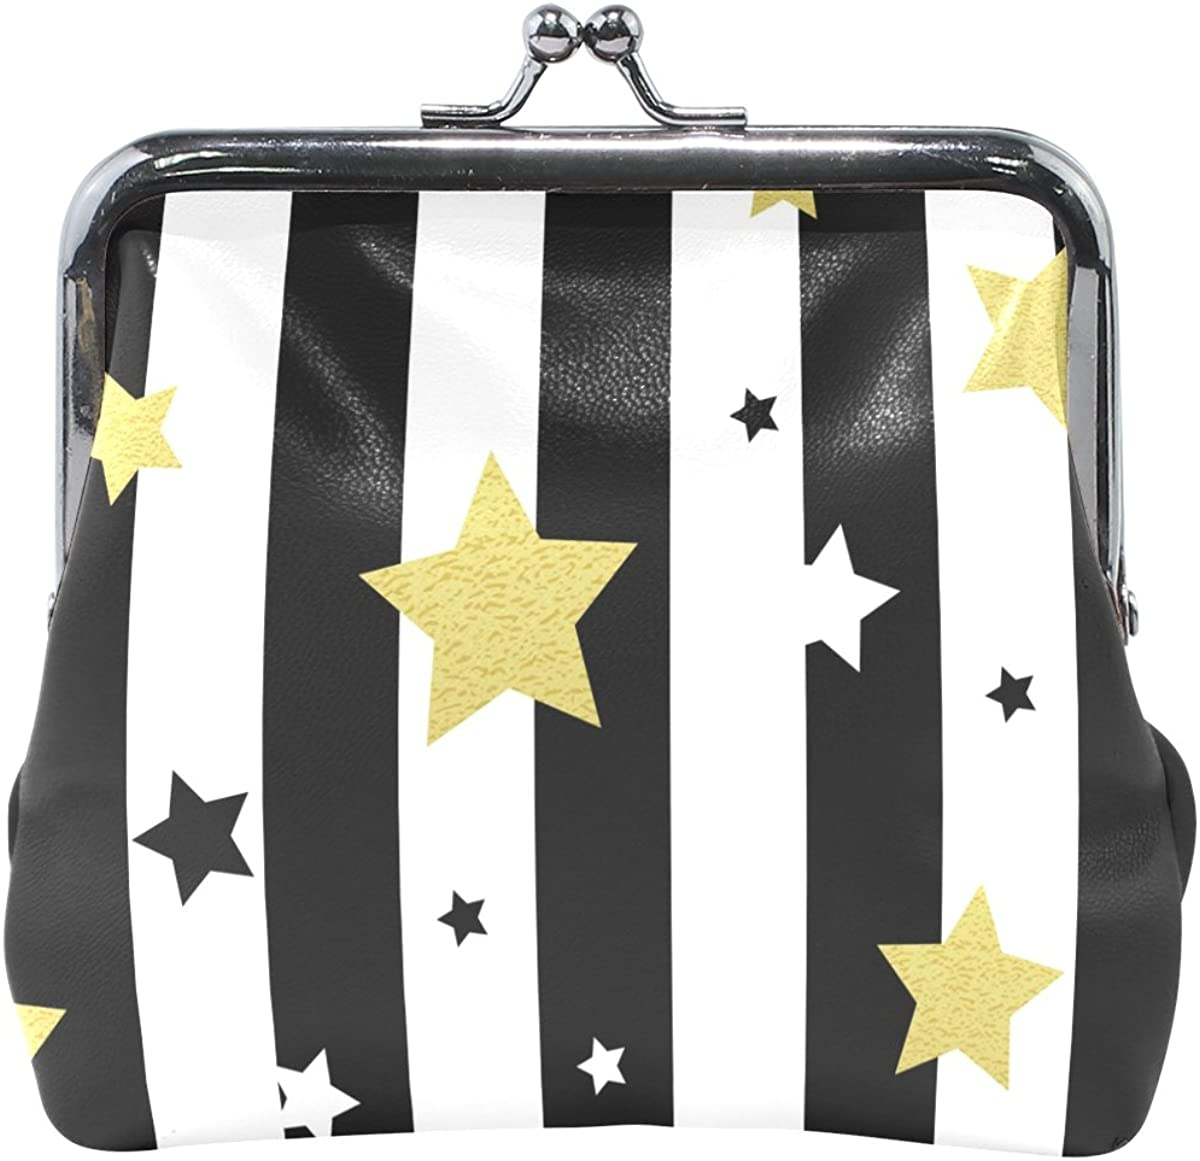 MALPLENA Black White And Gold Stars Seamless Patterns change purse for women leather purse